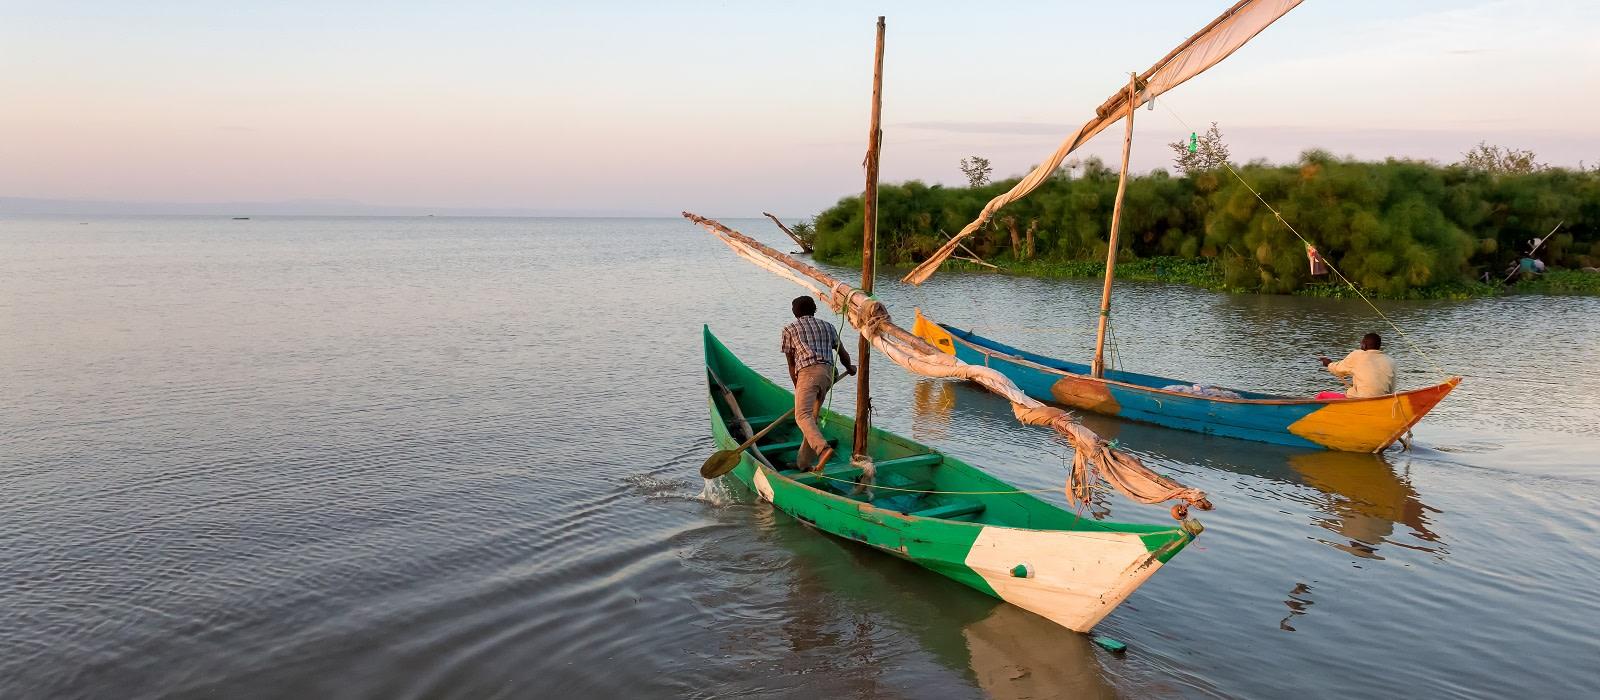 Enchanting Travels Uganda Tours Bulago Island Lake victoria fishermen go to work - culture of Uganda